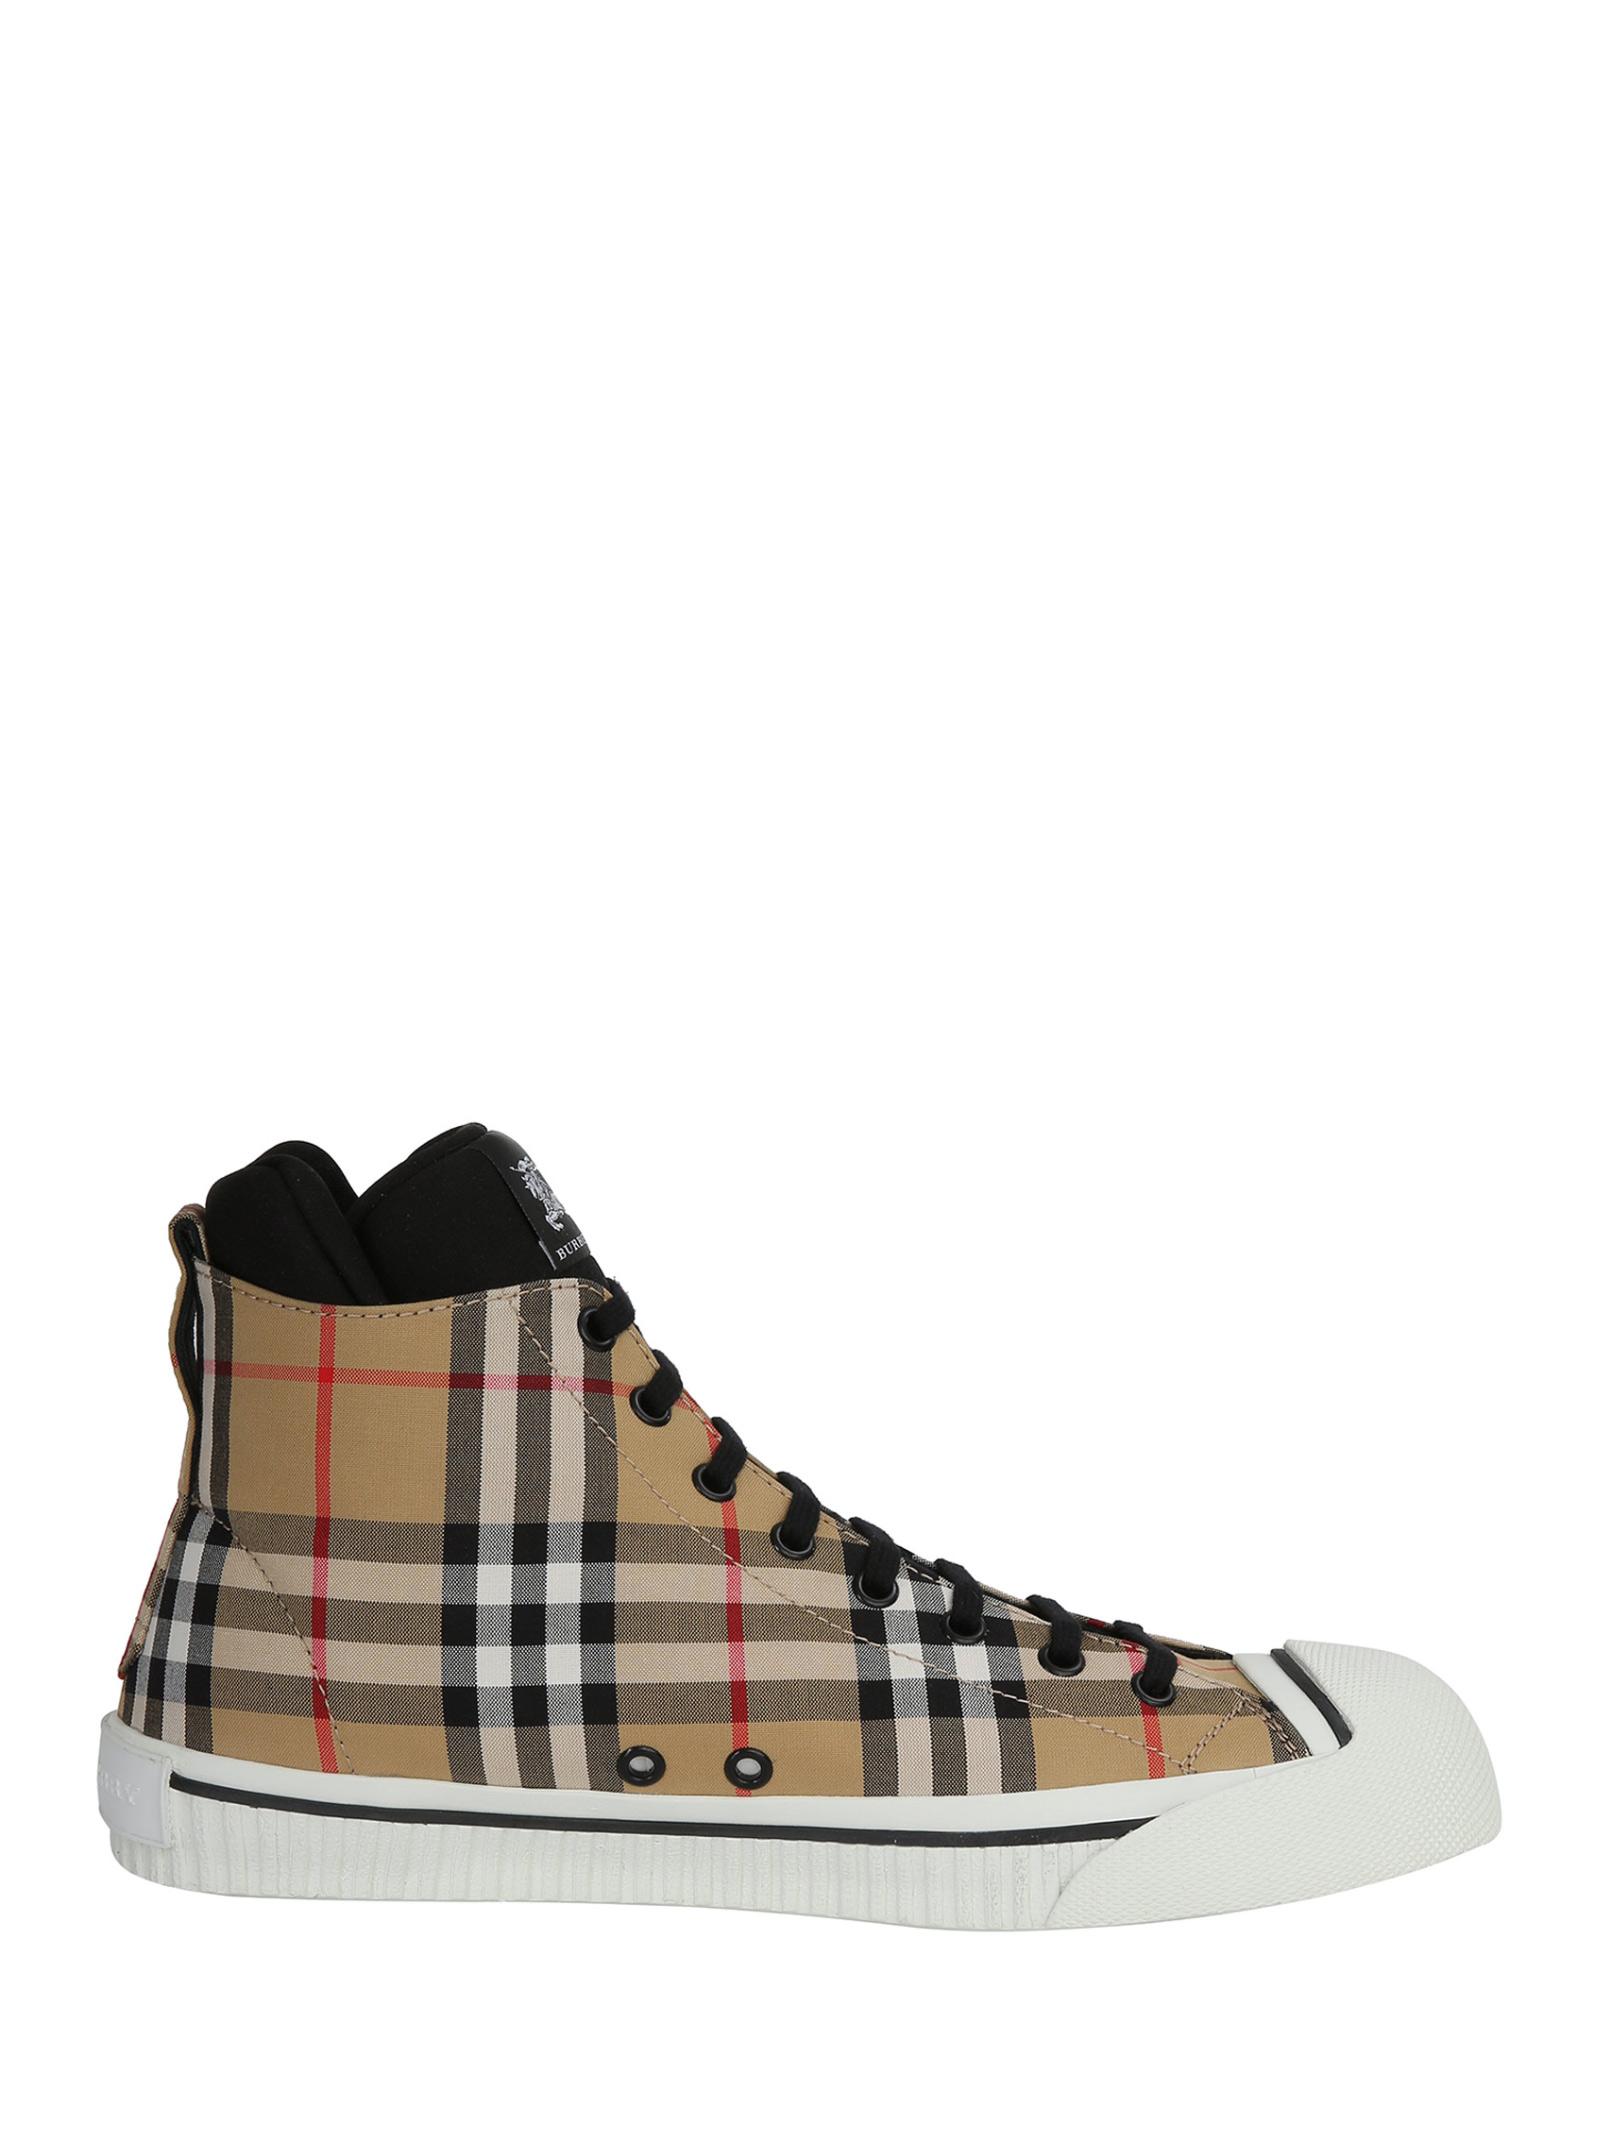 17eea1db90a1 Michele Franzese Moda. 0. Sneakers Burberry BURBERRY